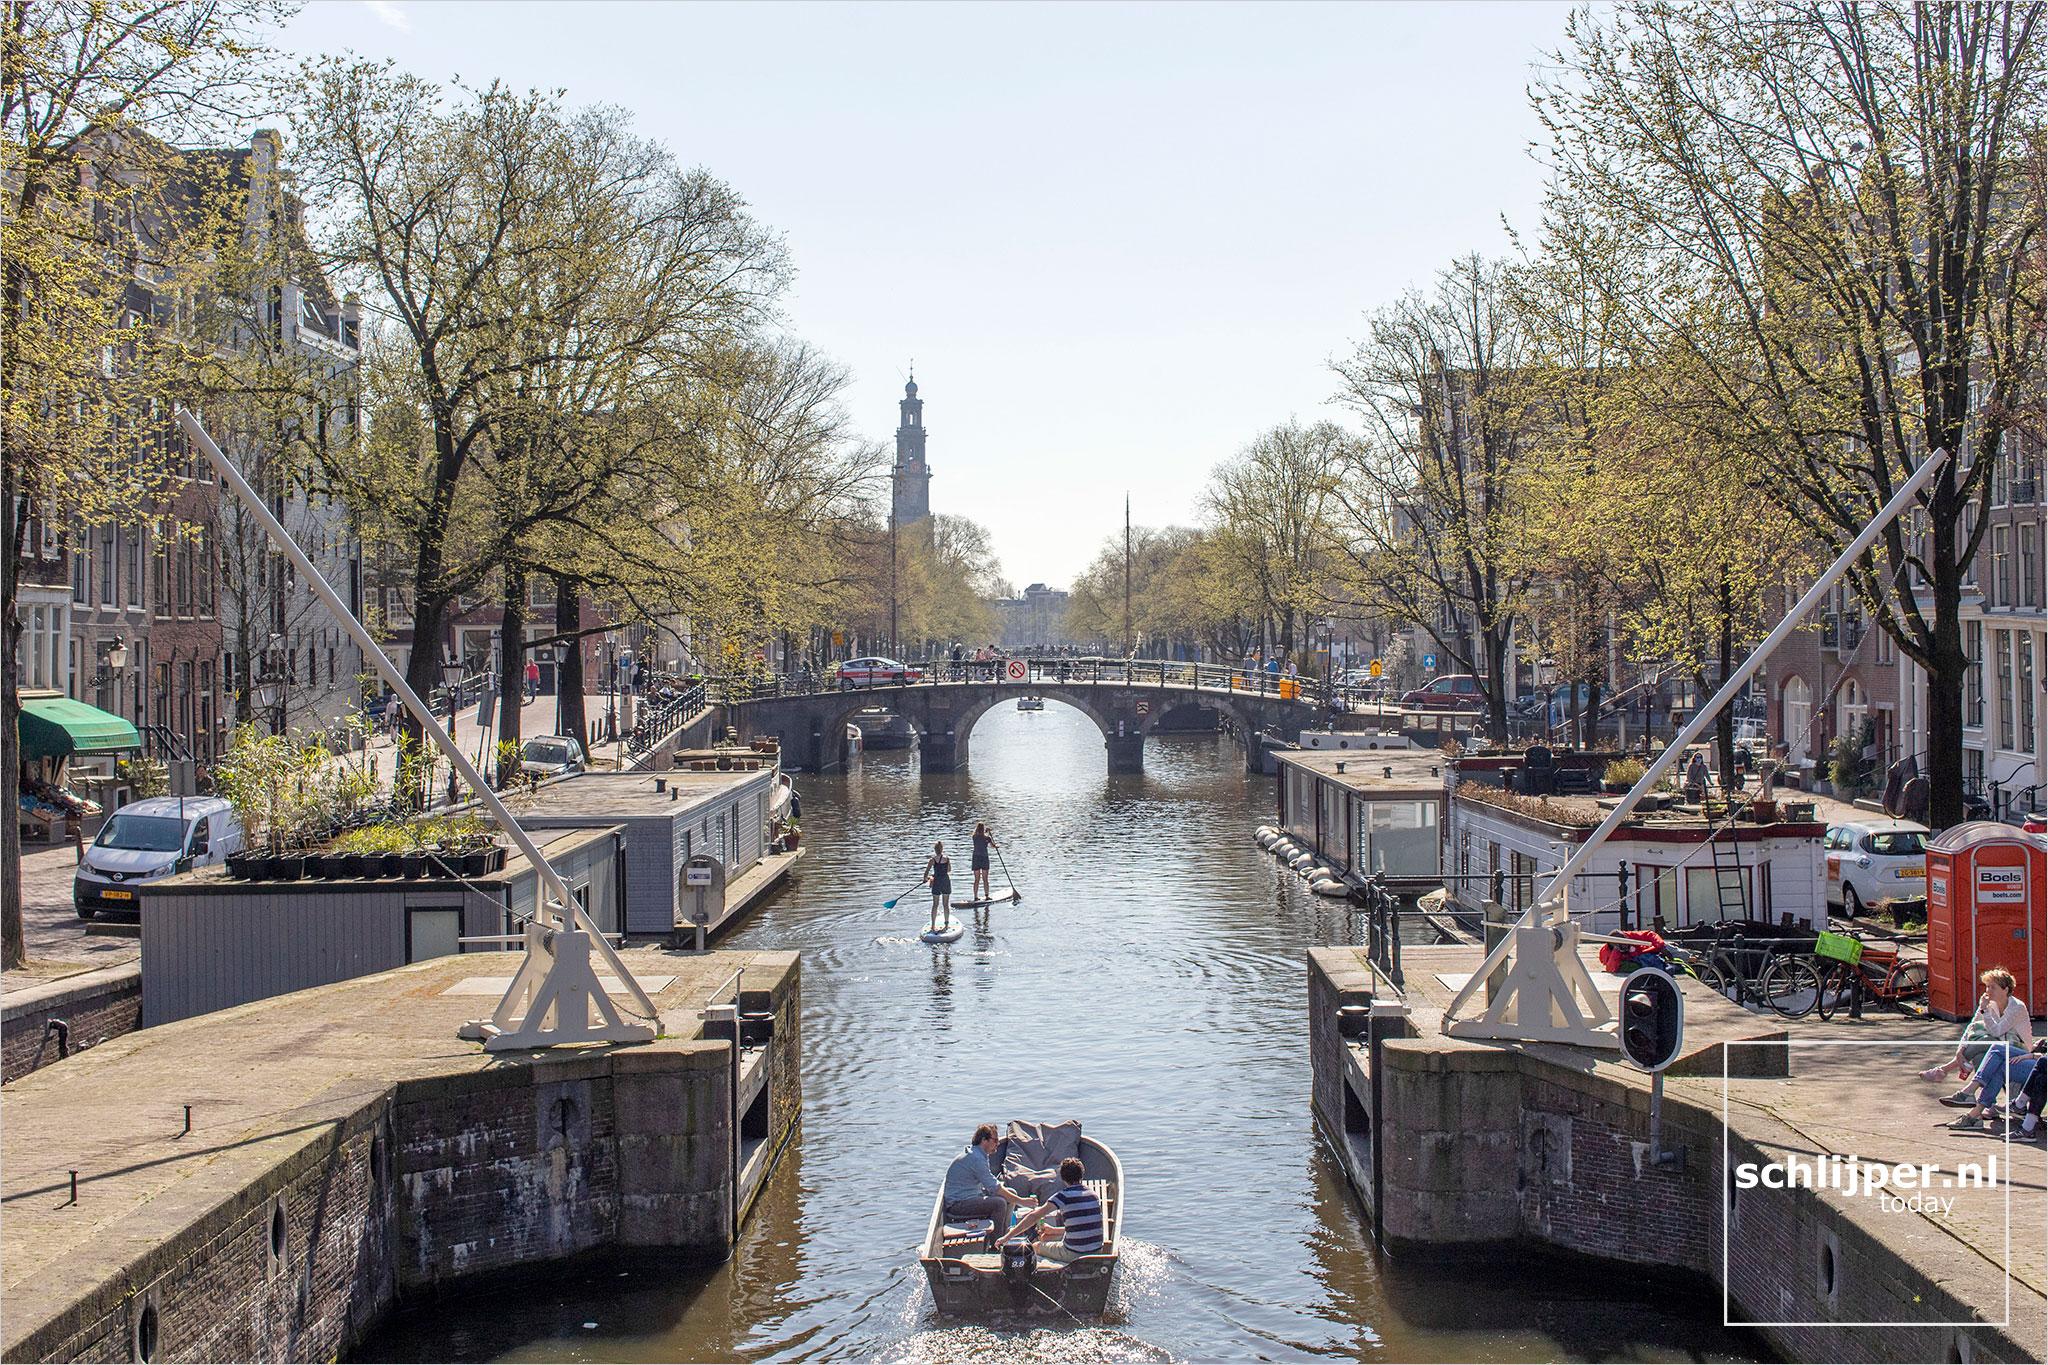 The Netherlands, Amsterdam, 31 maart 2021